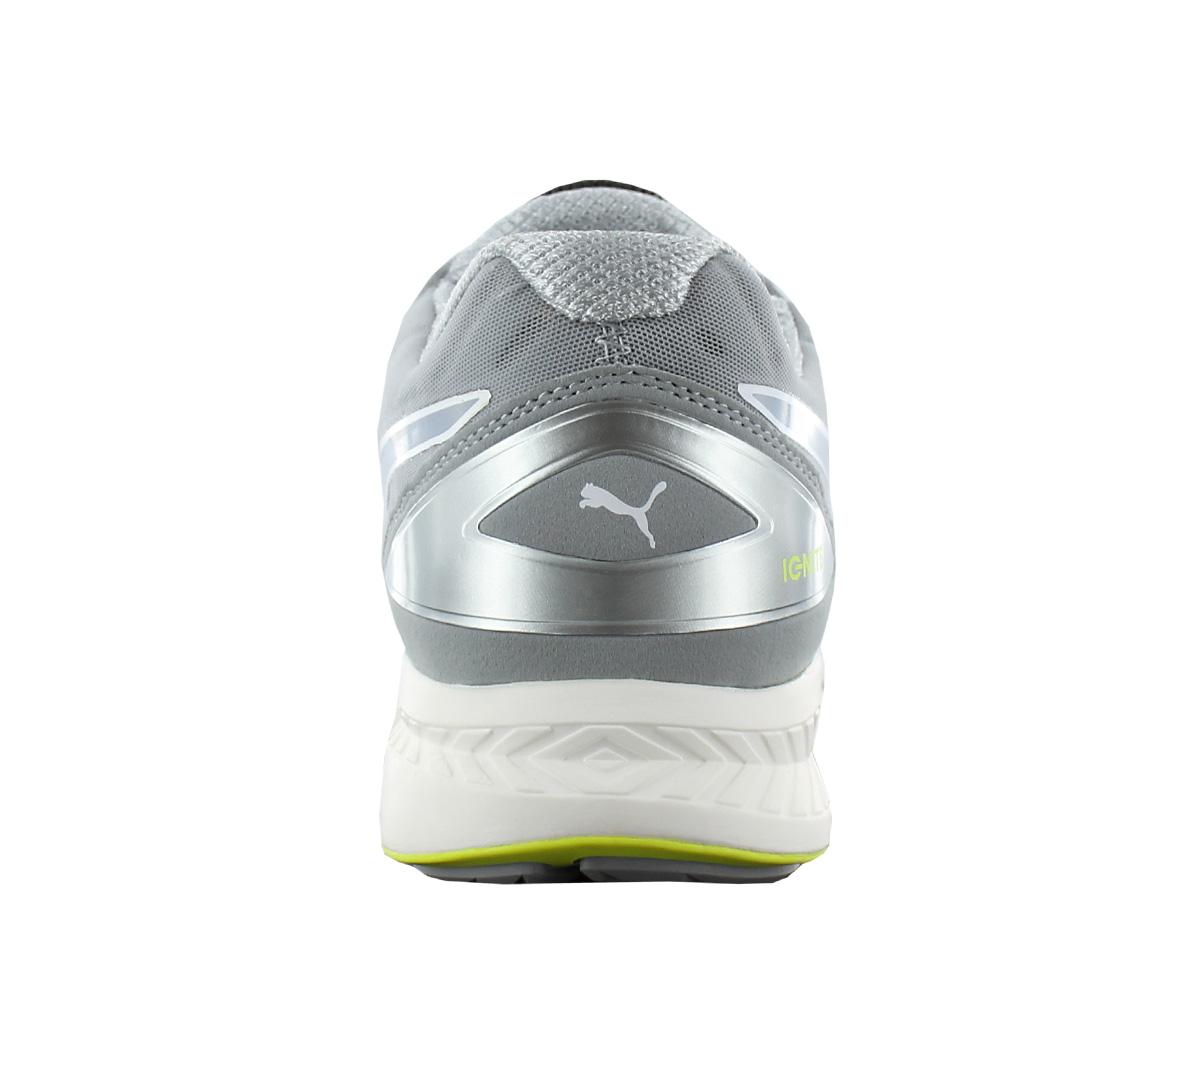 b36cefd0d73 Puma Ignite Disc Men s Shoes Sneakers Grey Running Shoes 188616-05 ...